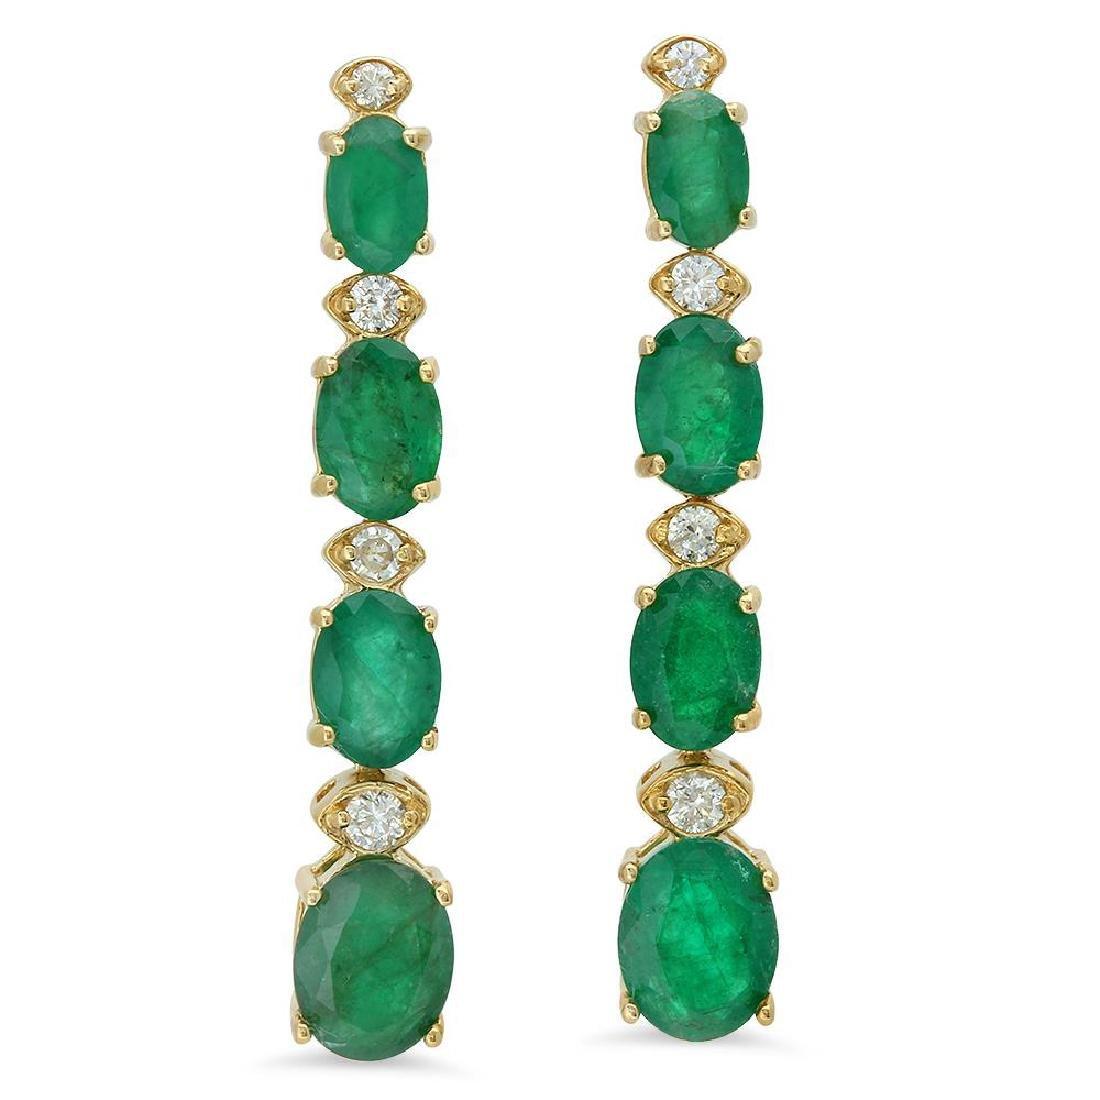 14K Gold 5.55ct Emerald 0.33 Diamond Earrings